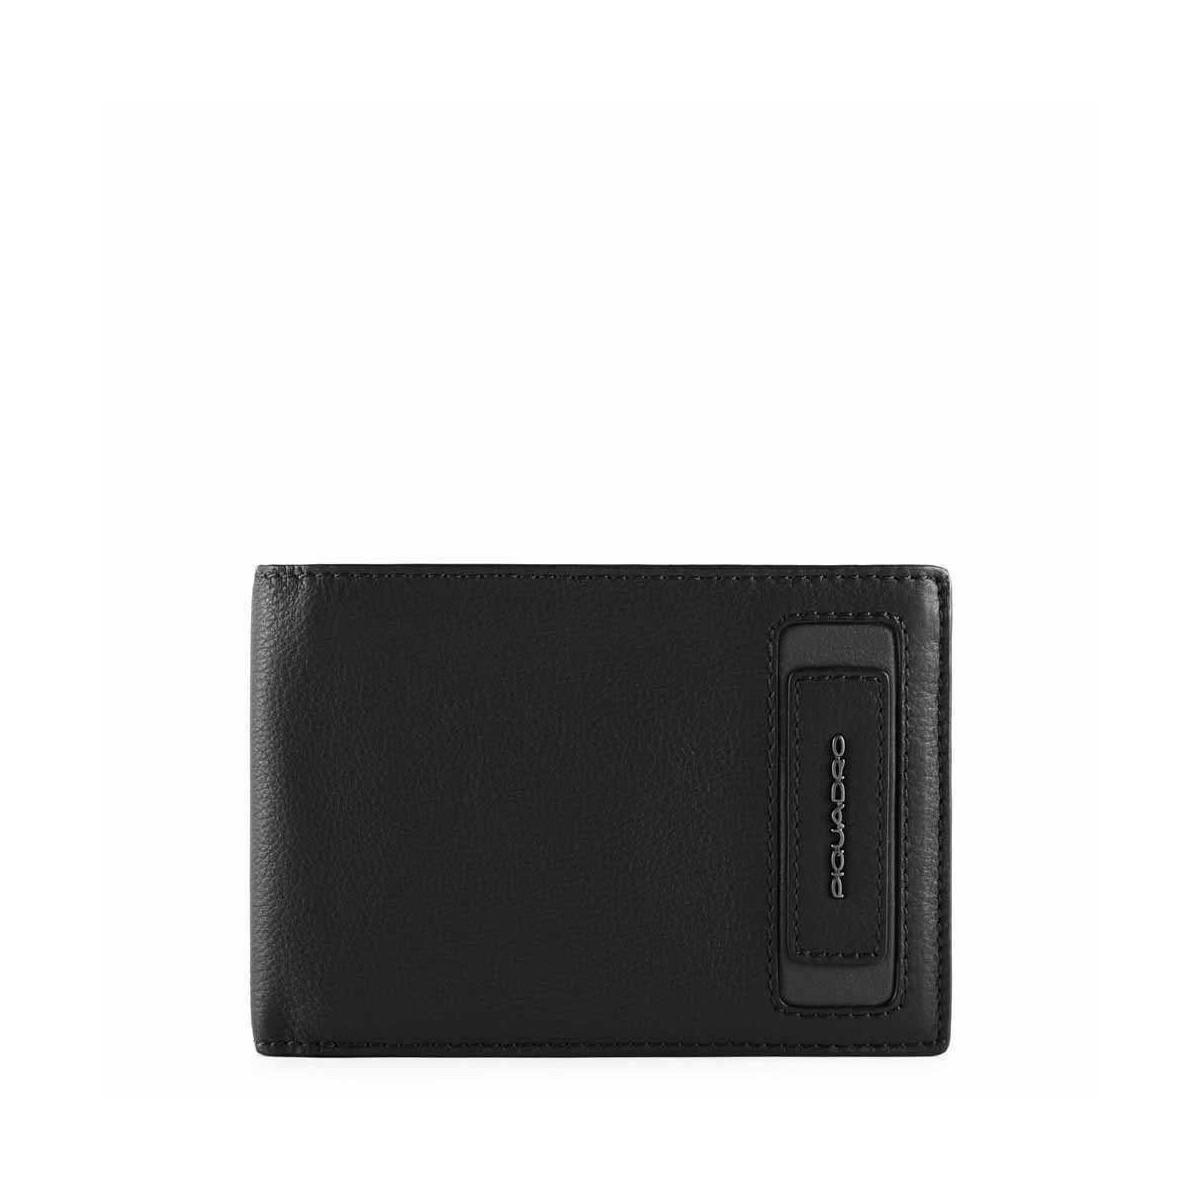 PIQUADRO Dioniso portafogli uomo 6 cc, RFID, pelle nero